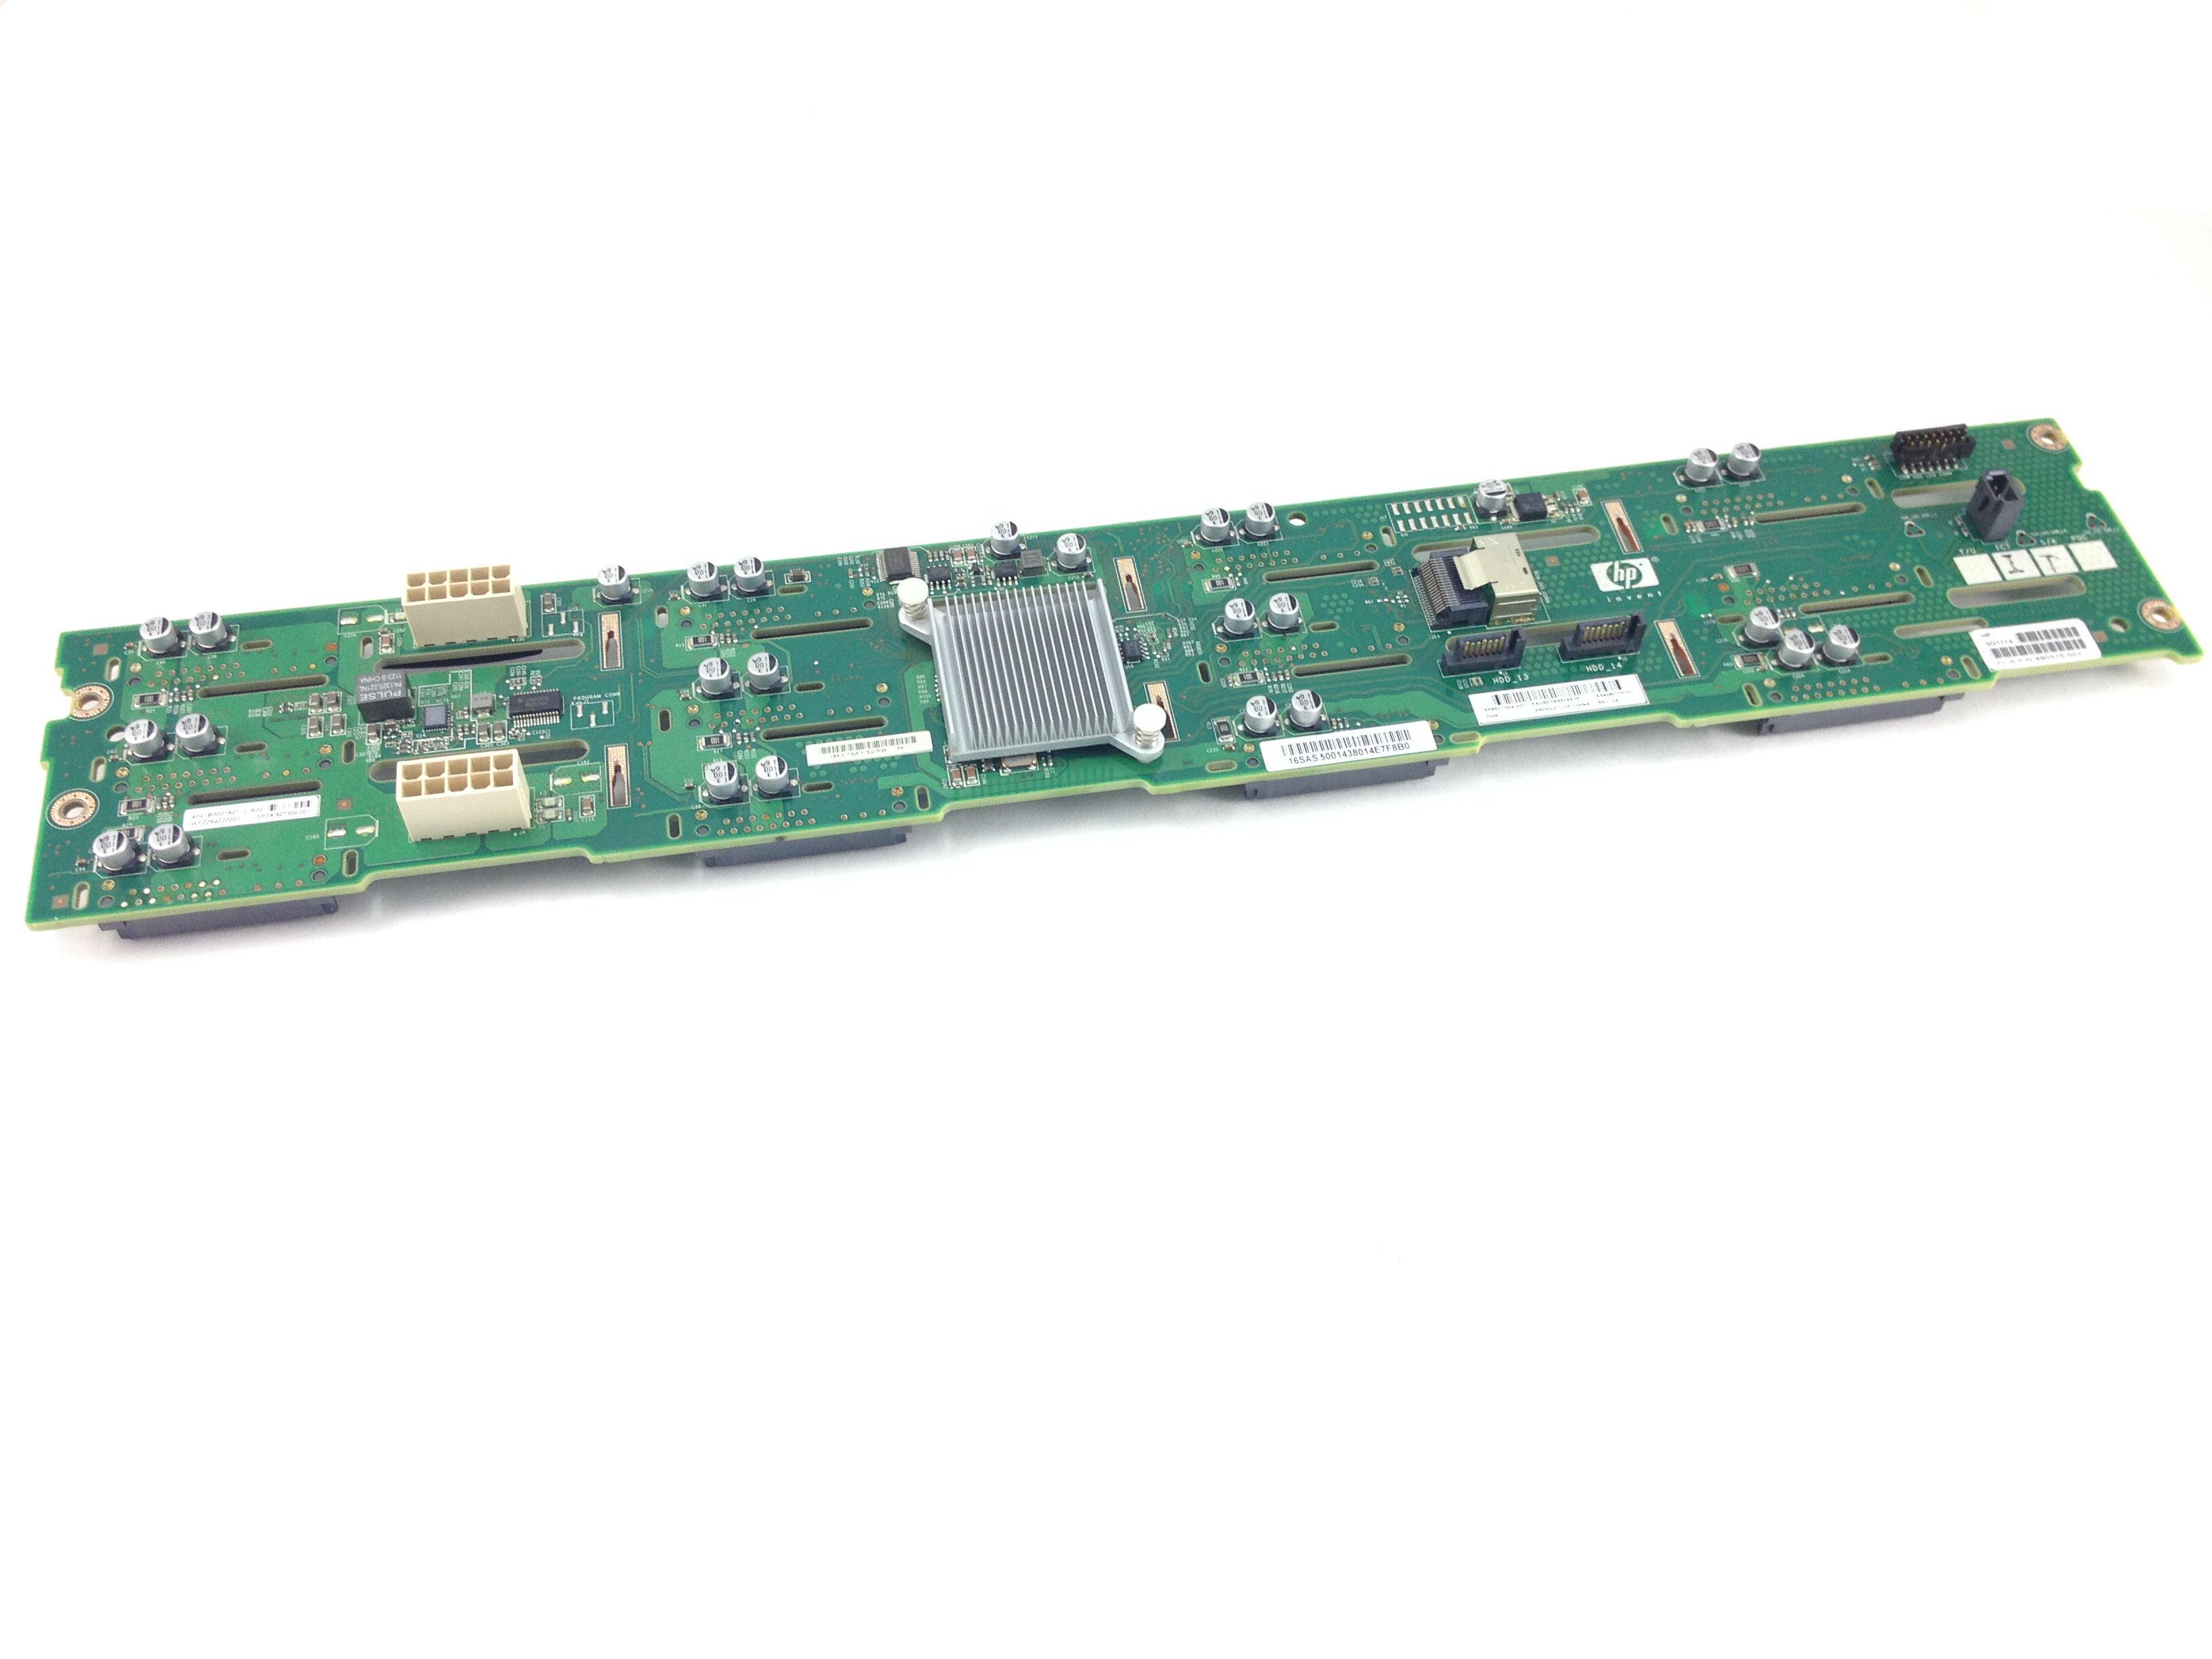 HP Proliant DL180 G6 Server 12 Bay LFF Backplane Board (507304-001)